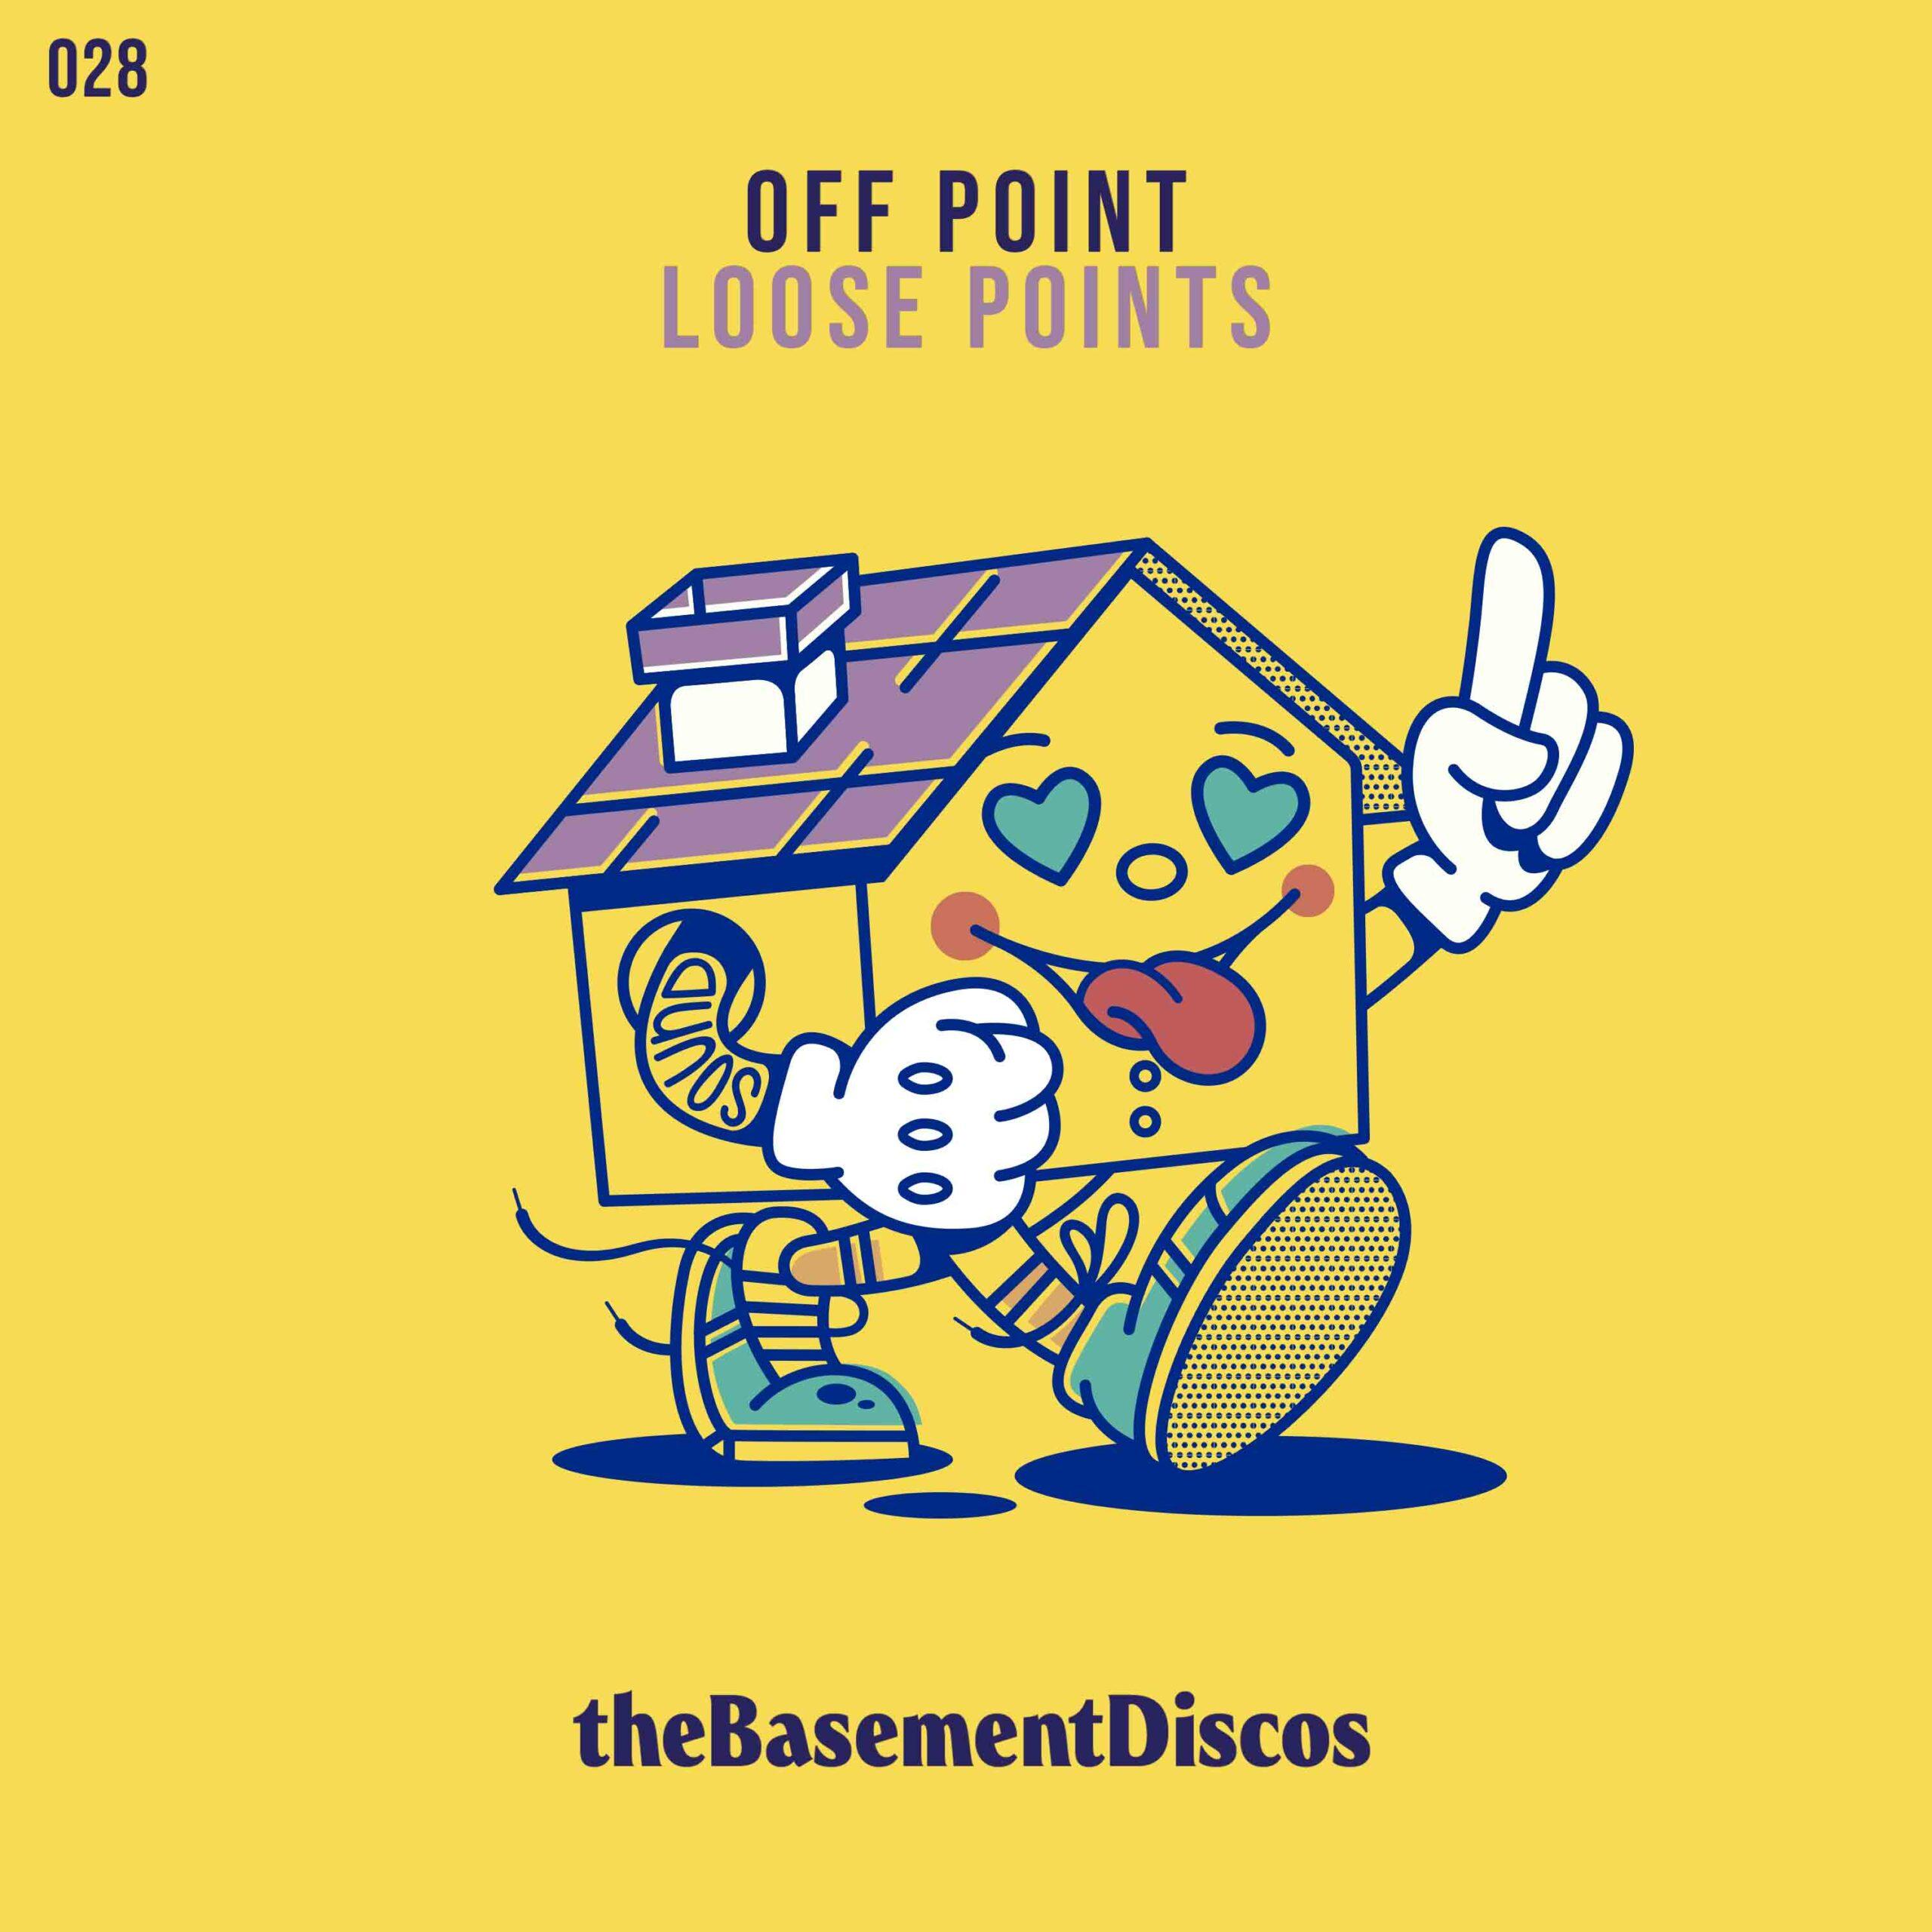 the-basement-thebasement-thebasementdiscos-off-point-loose-points-valencia-dj-disco-house-good-feelings-portada